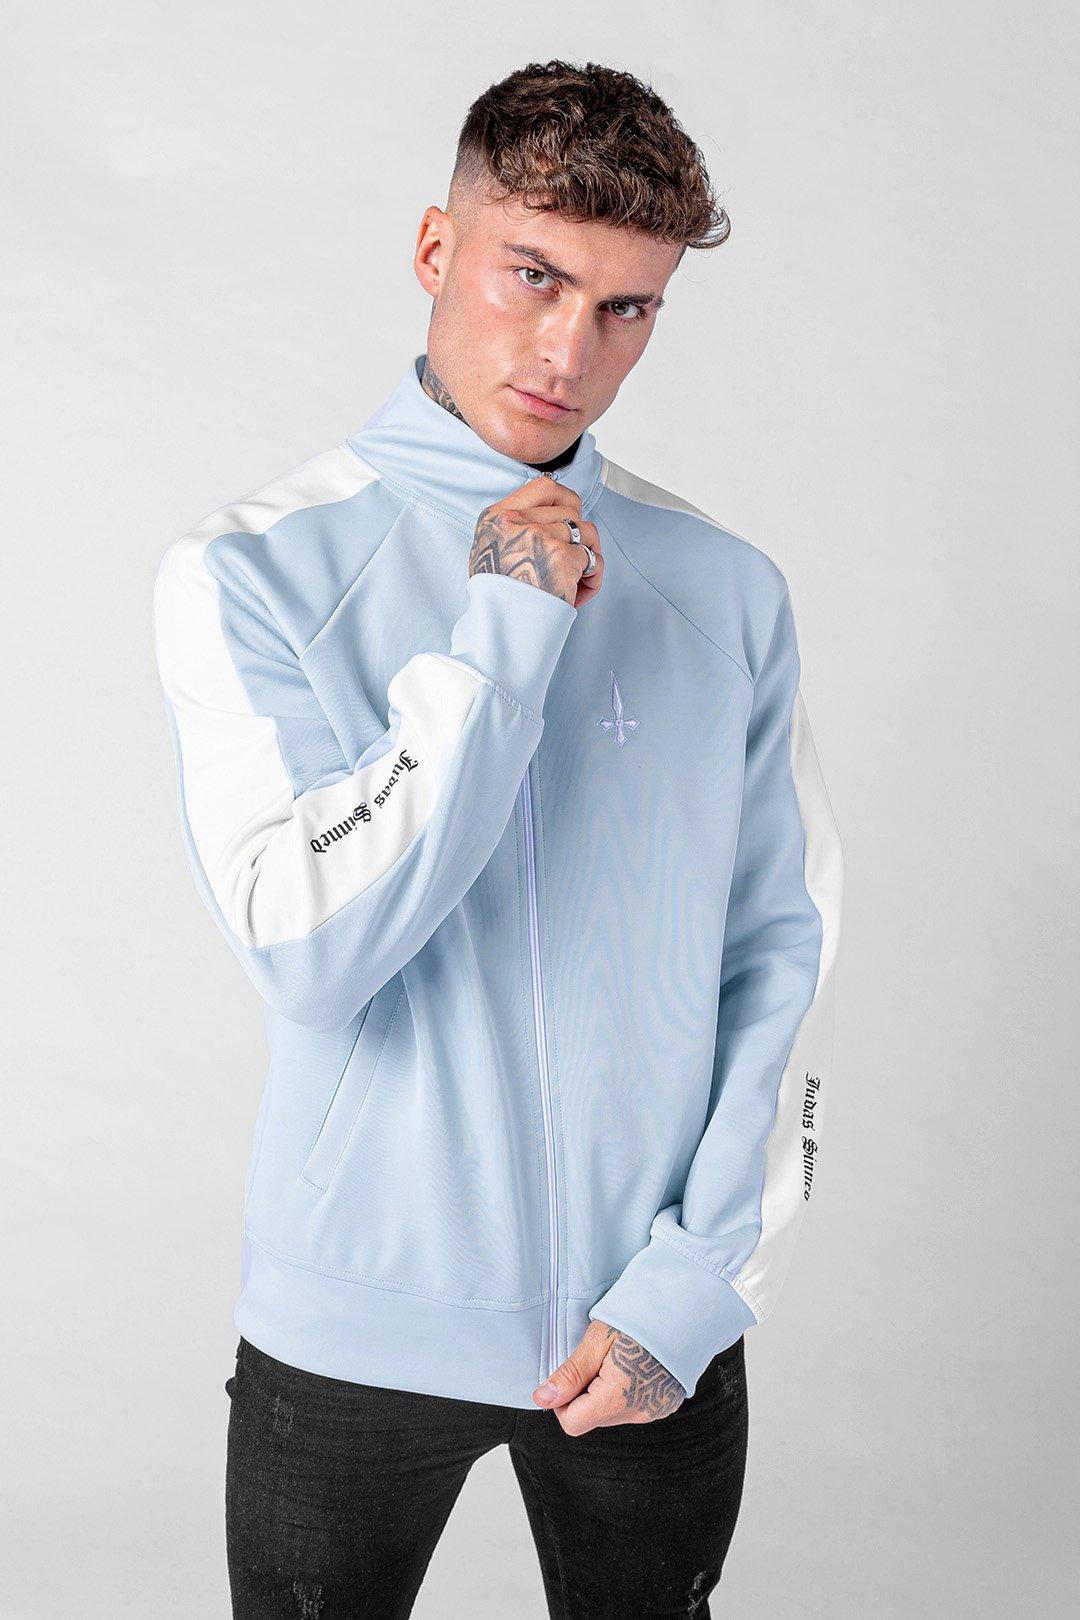 Match Zip Sleeve Stripe Men's Track Top - Baby Blue, Small